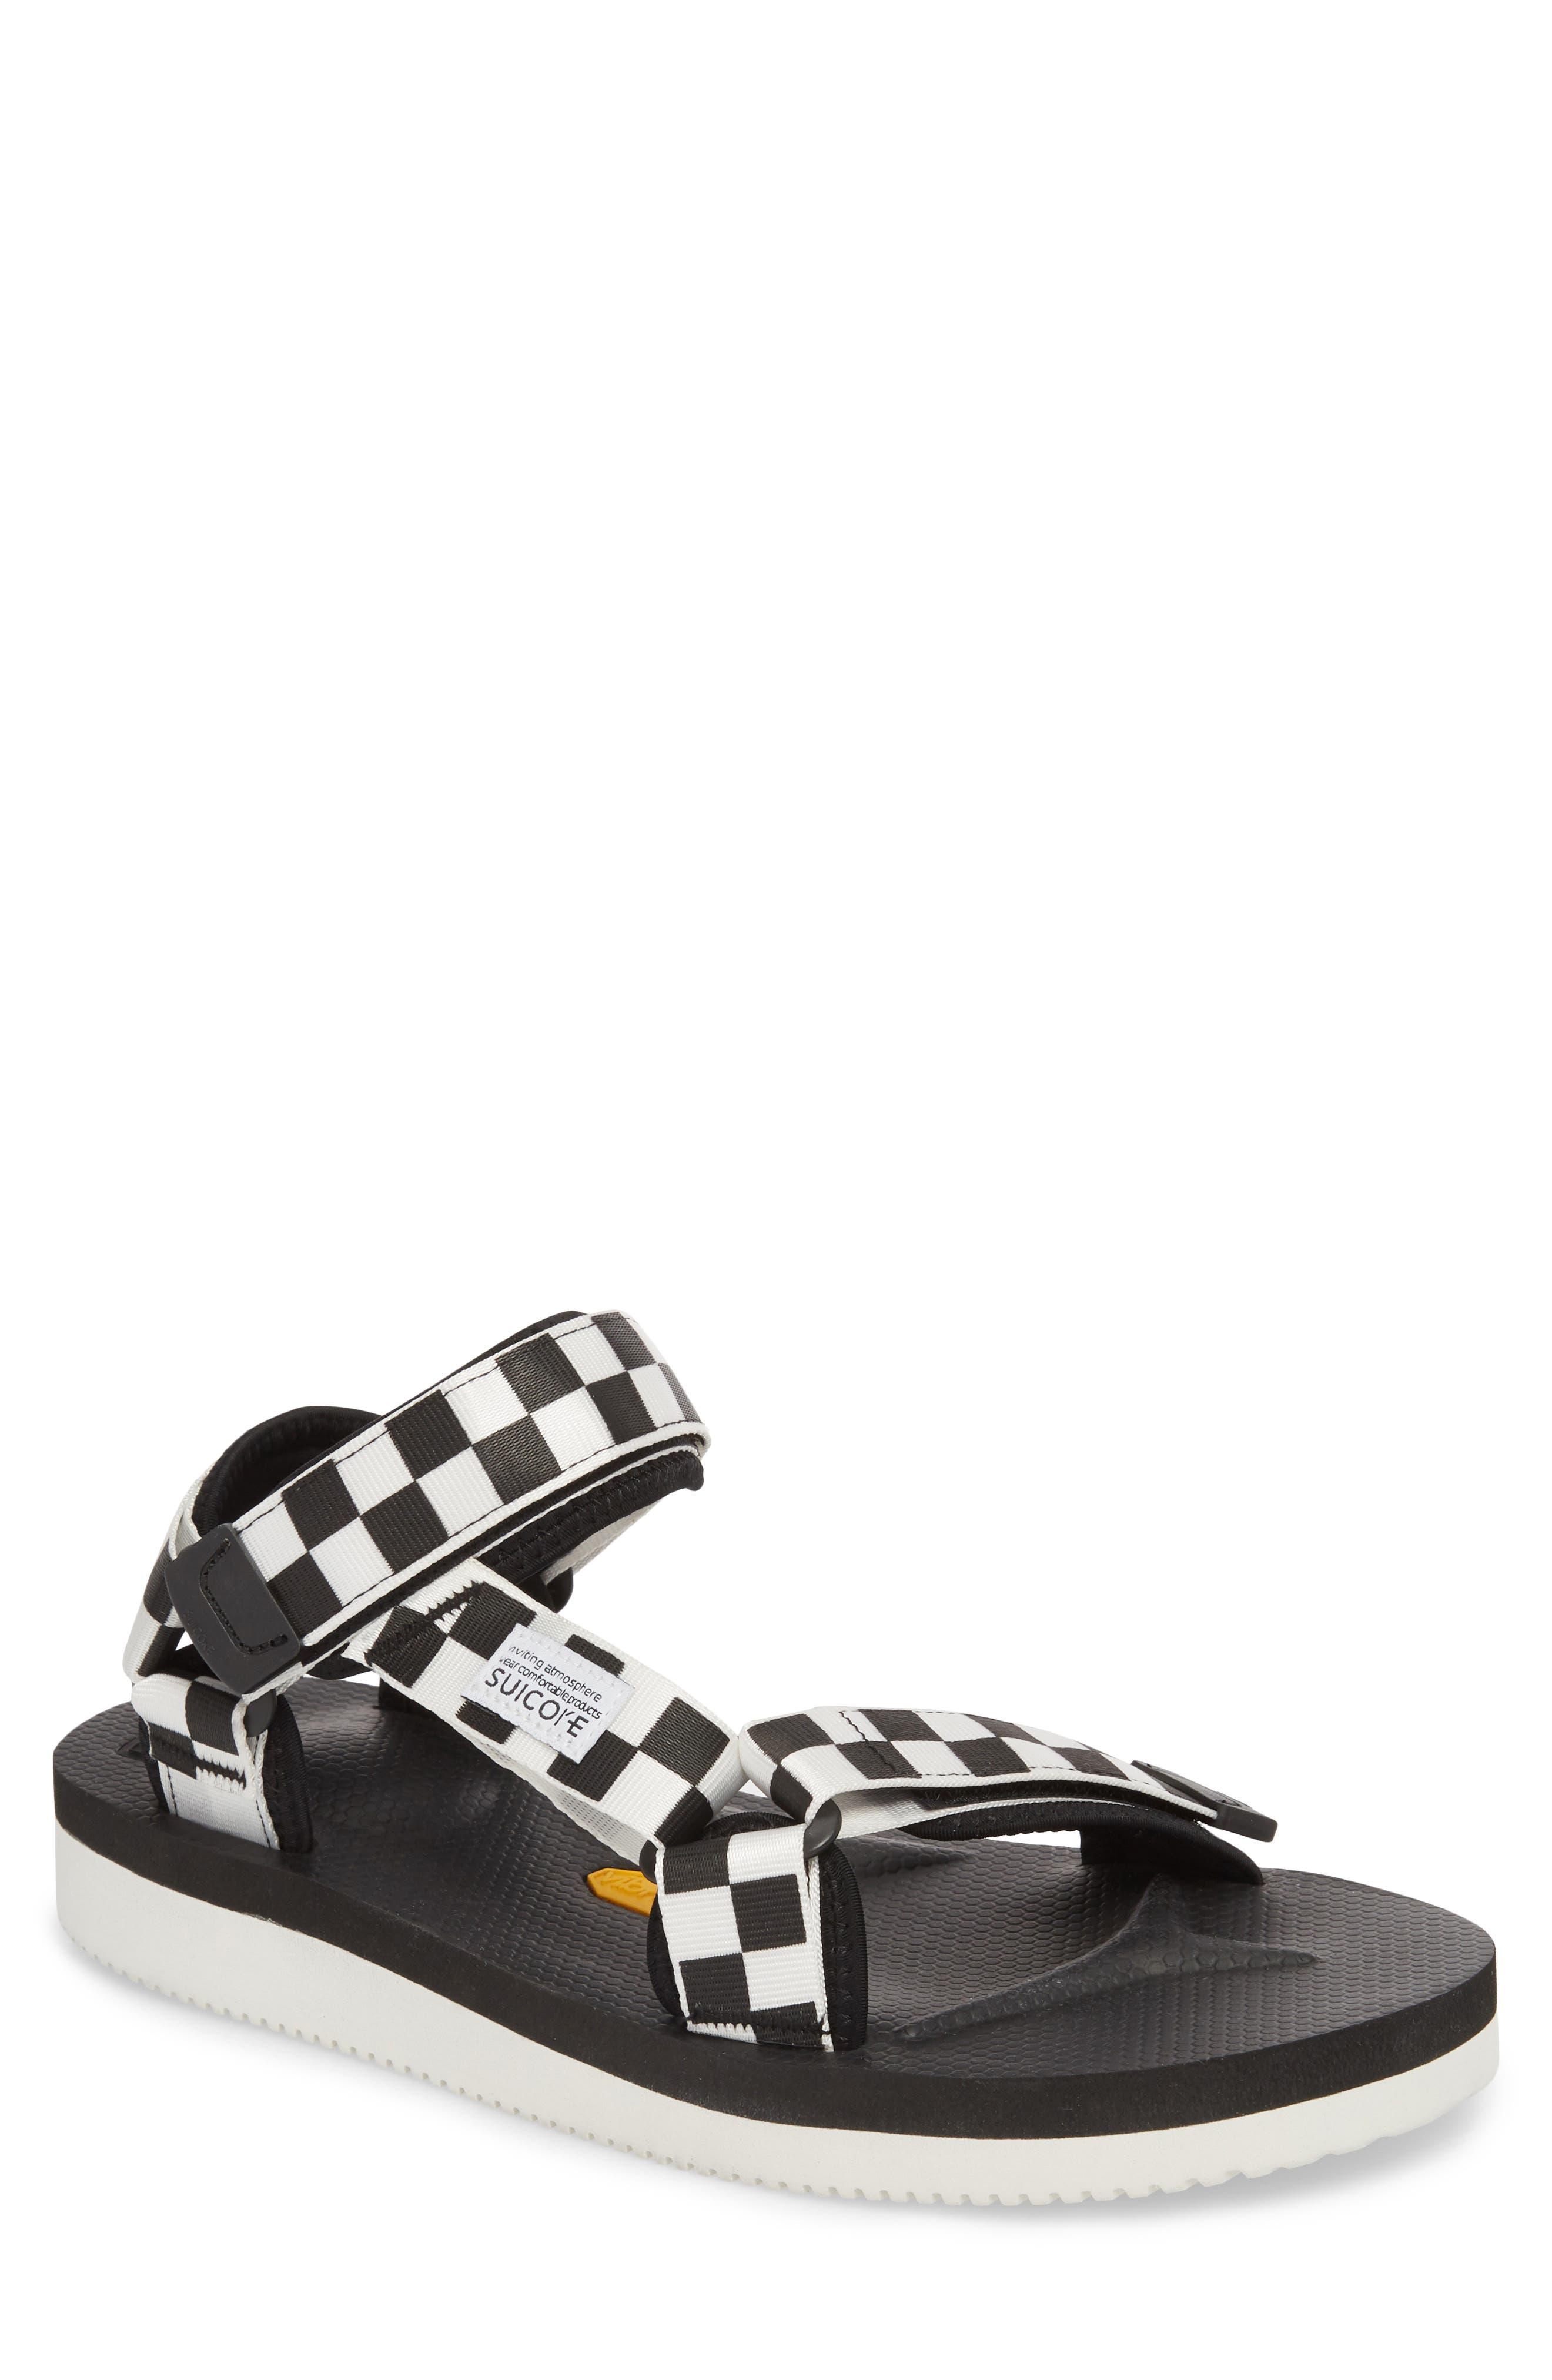 Depa Sport Sandal,                         Main,                         color, BLACK